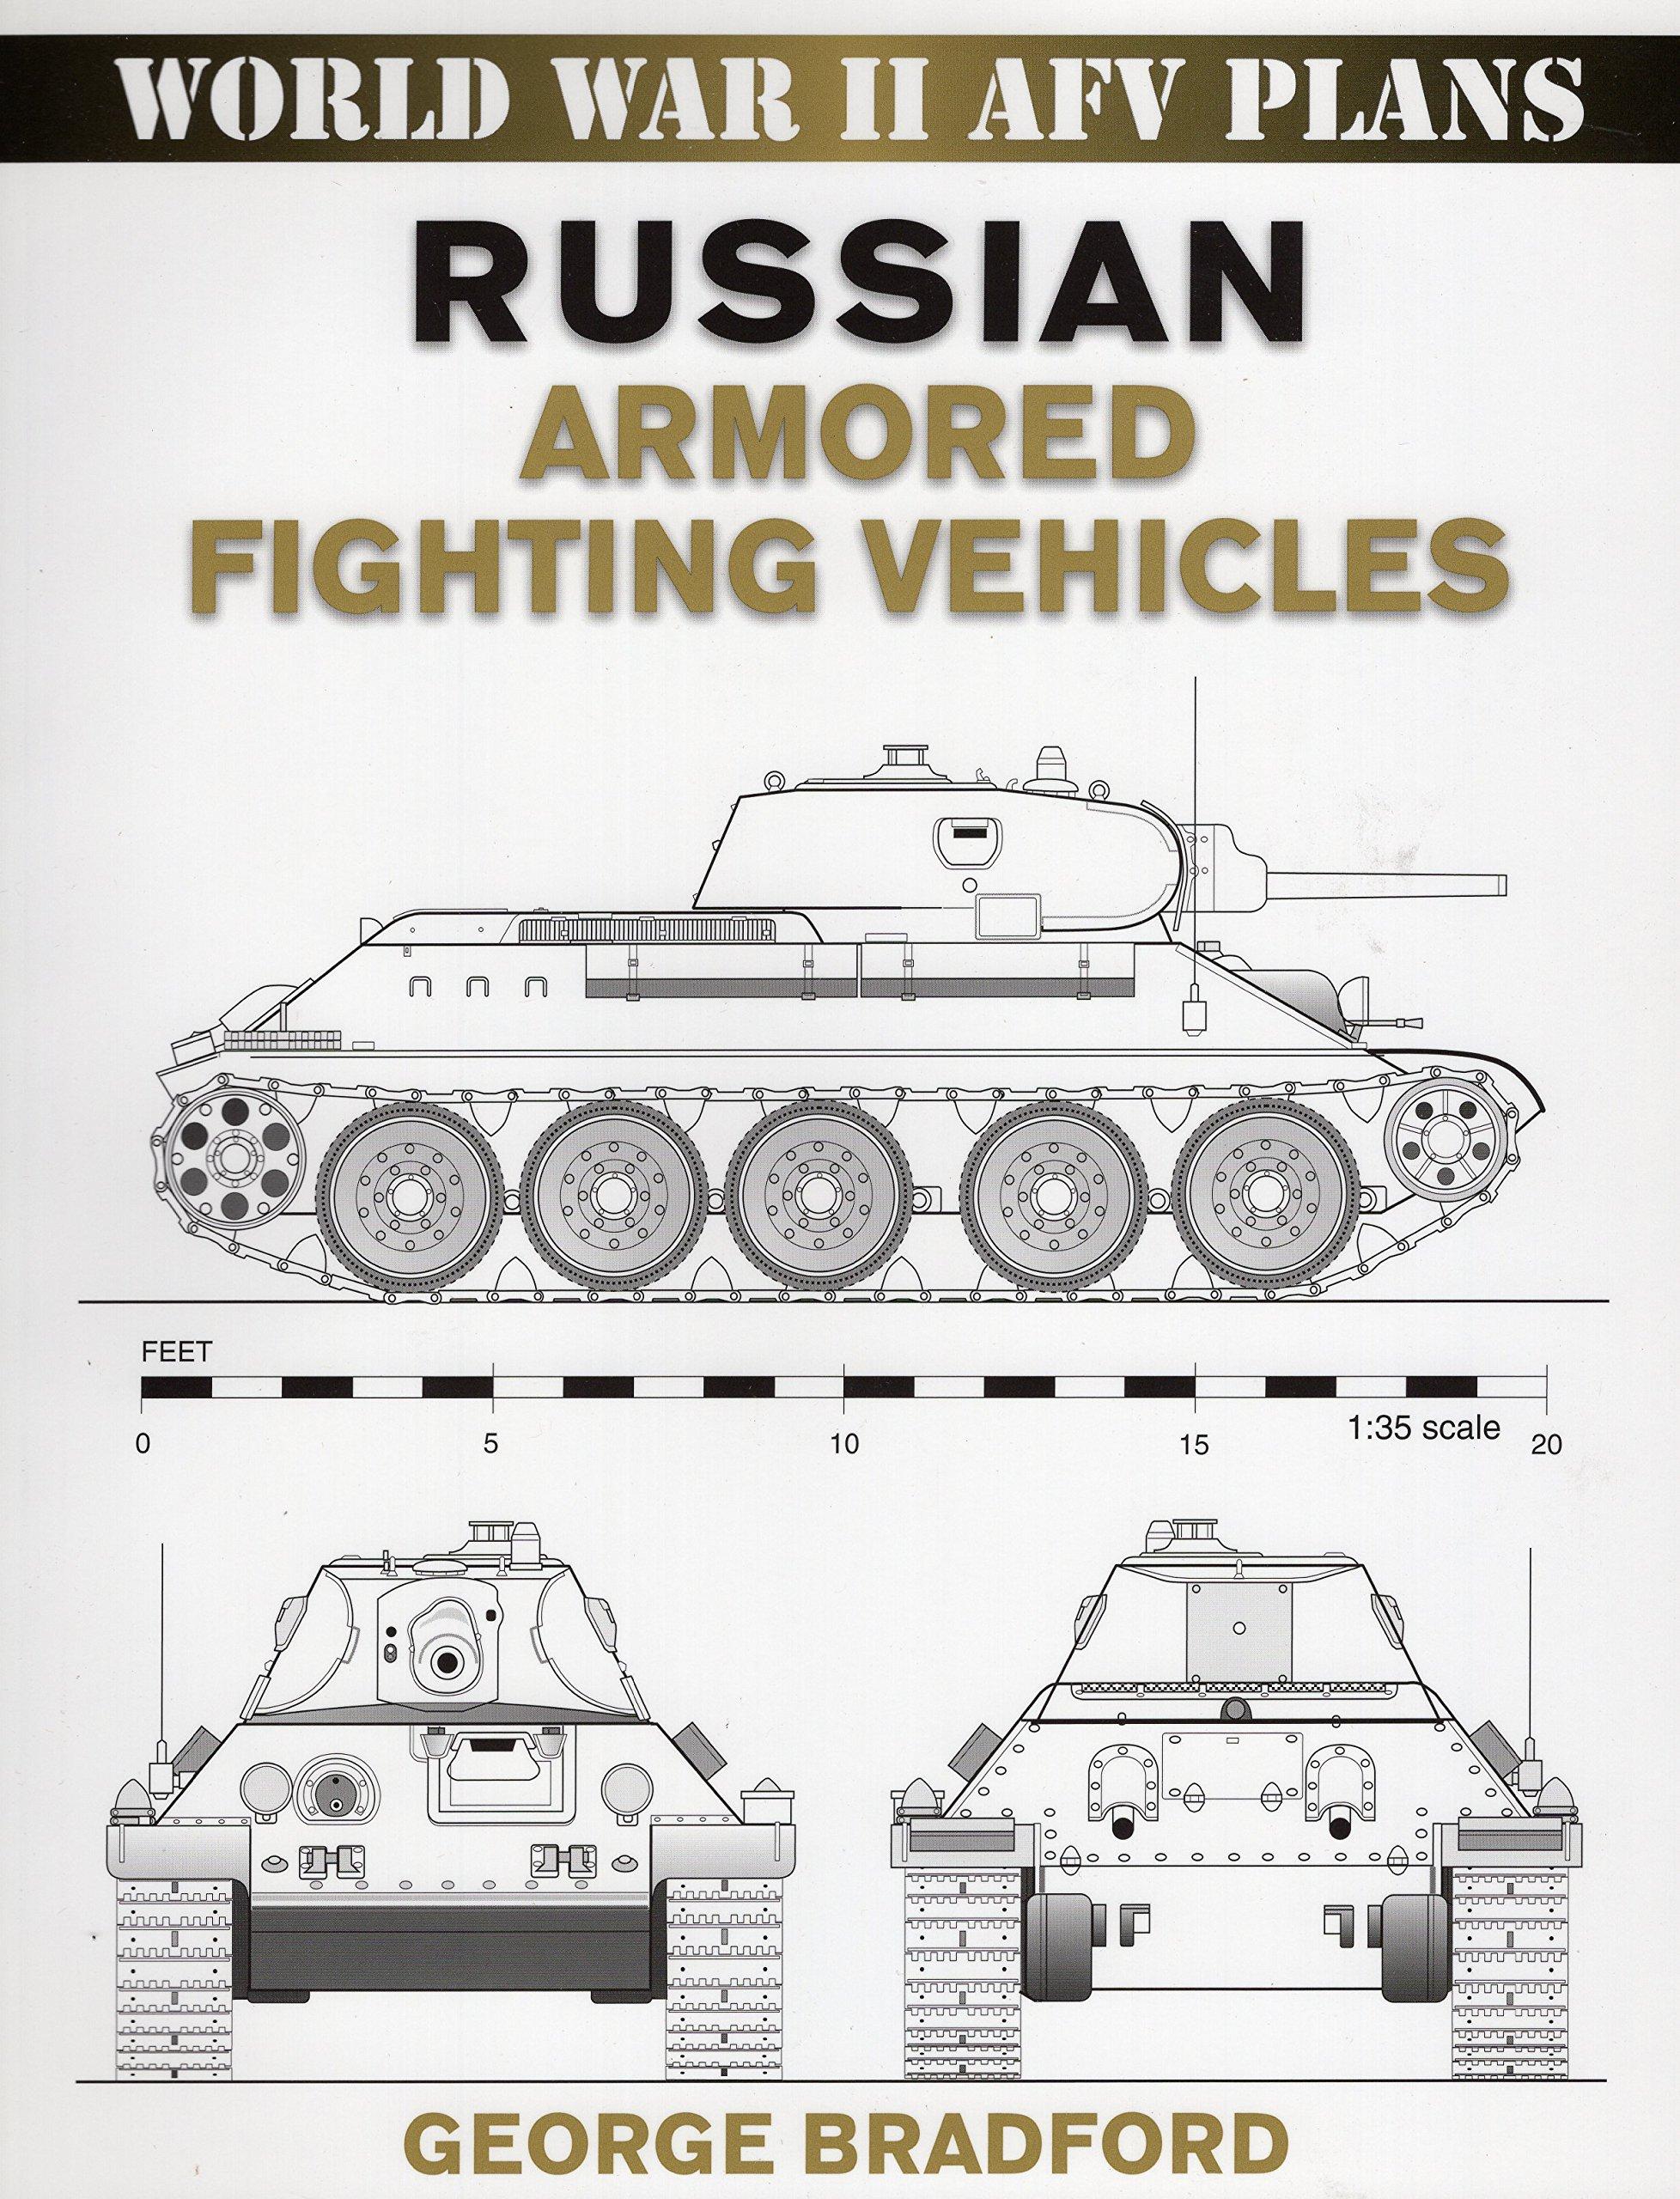 Russian Armored Fighting Vehicles: World War II AFV Plans (World War 2 AFV Plans) por George Bradford